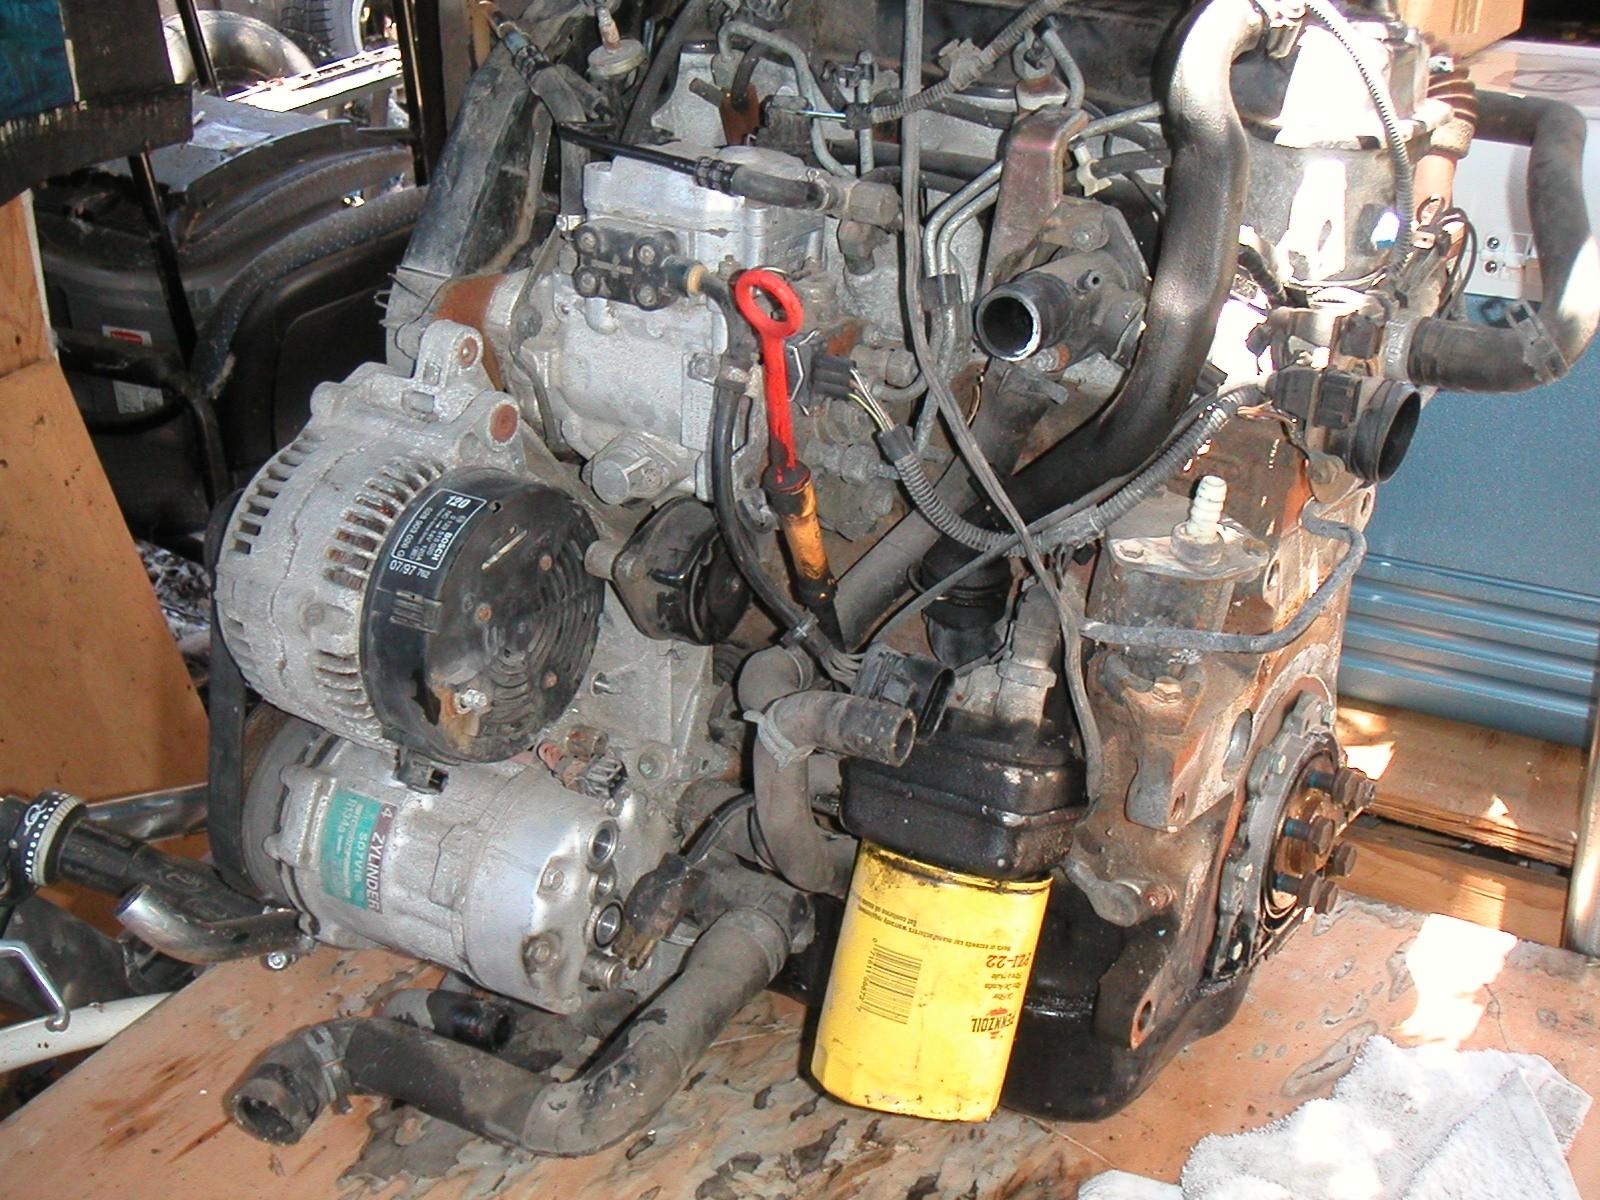 2001 vw jetta vr6 engine diagram vwvortex diy replacing spark plugs rh detoxicrecenze com 2001 Jetta Parts Diagram 2001 Jetta Parts Diagram